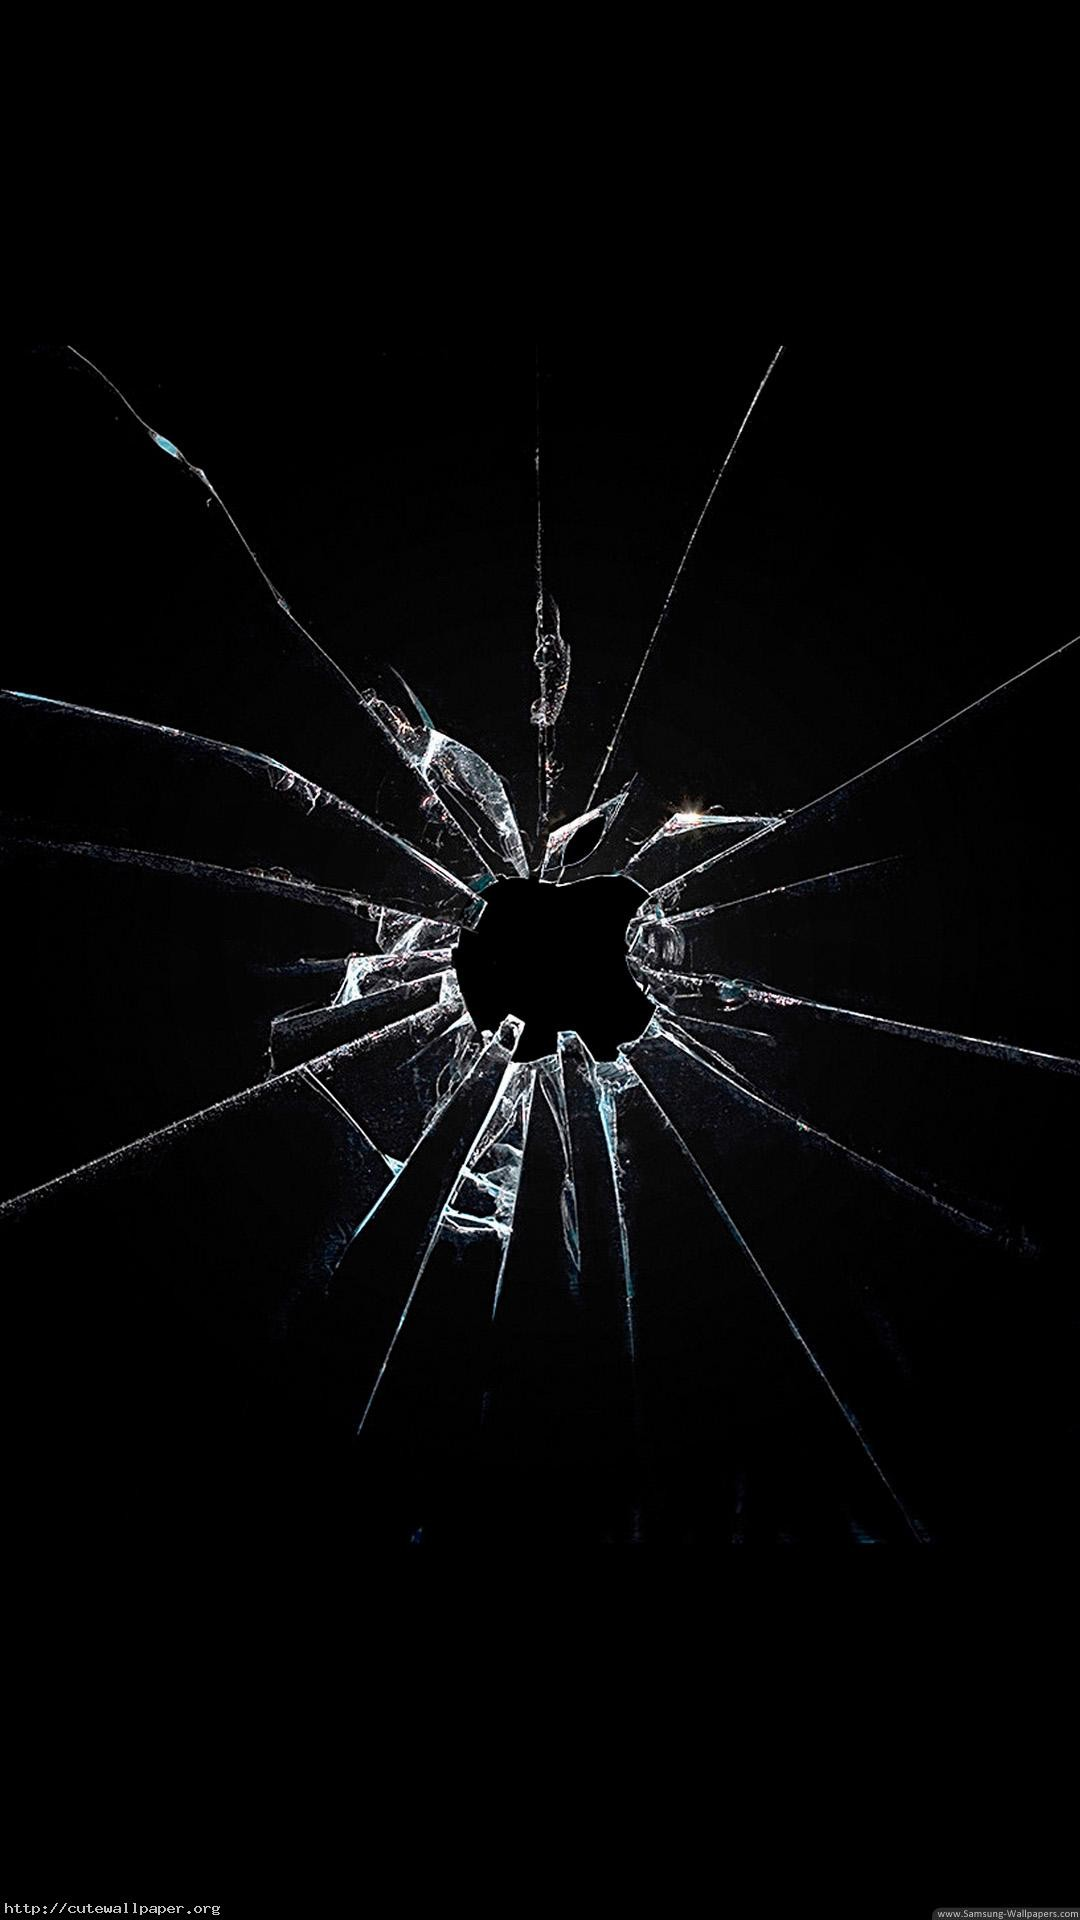 Broken Screen iPhone iPod Wallpaper WALLPAPER Smash